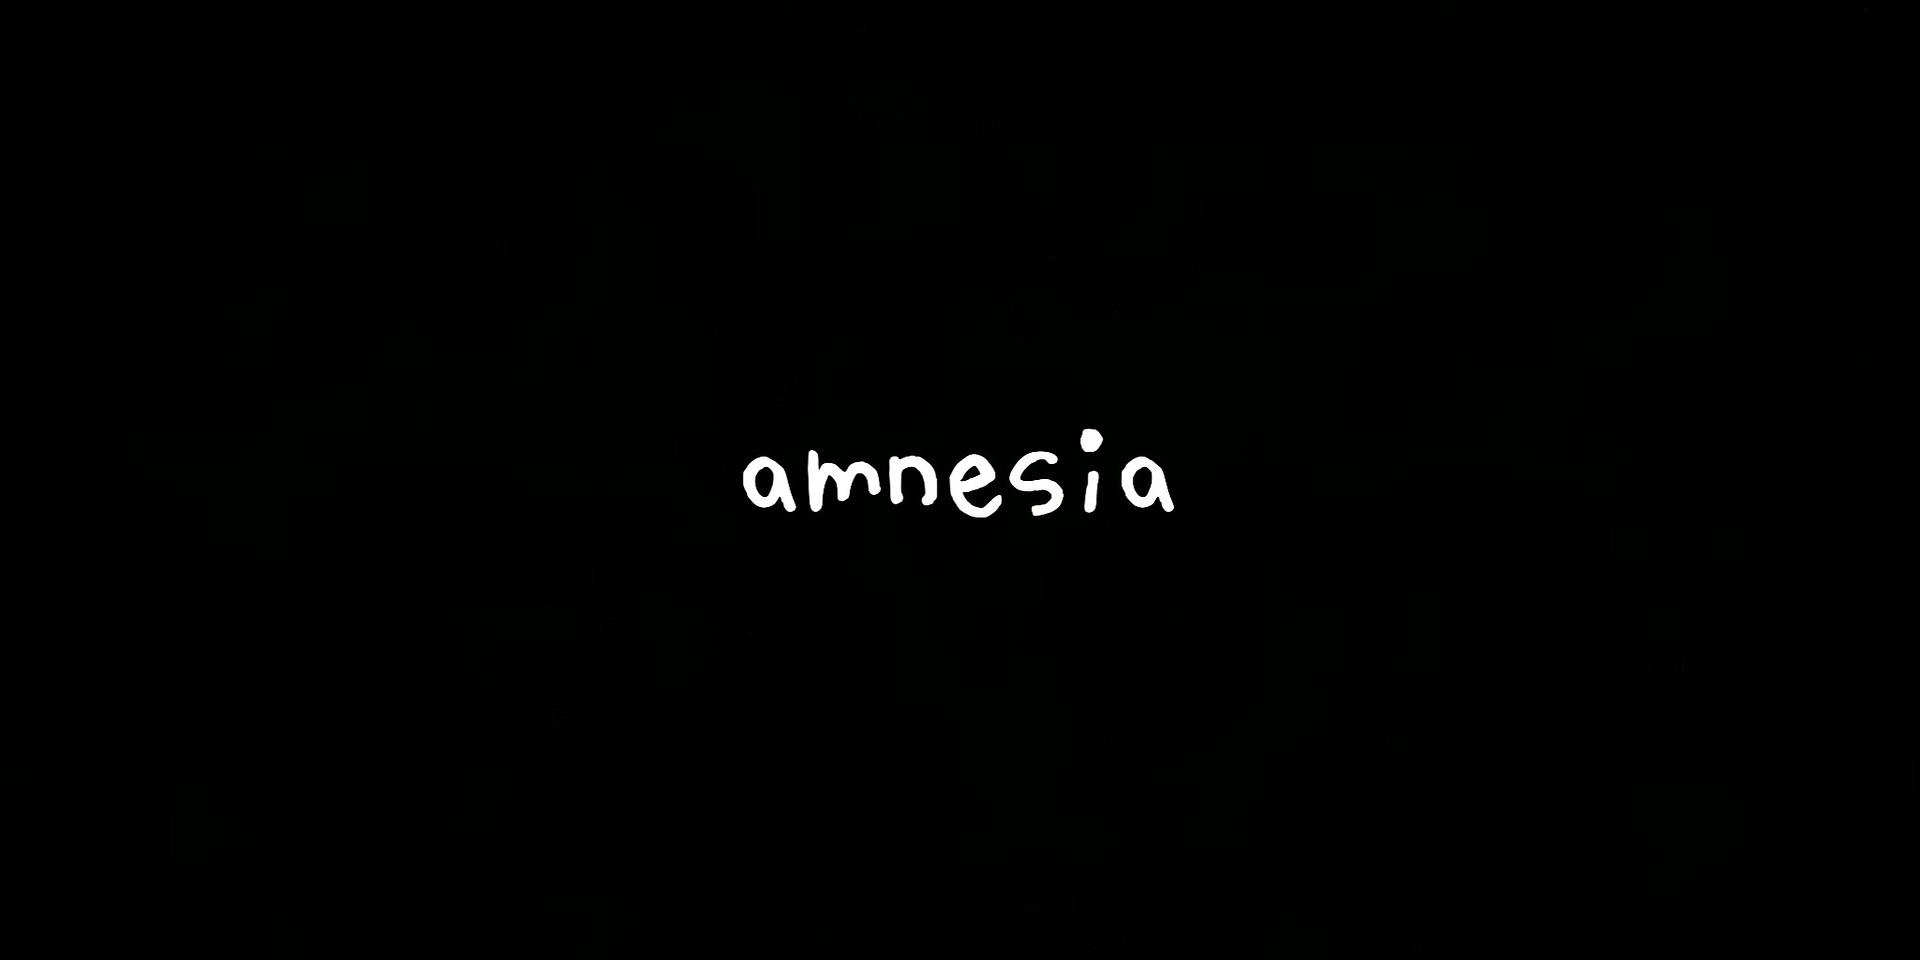 ALPHA23 AMNESIA